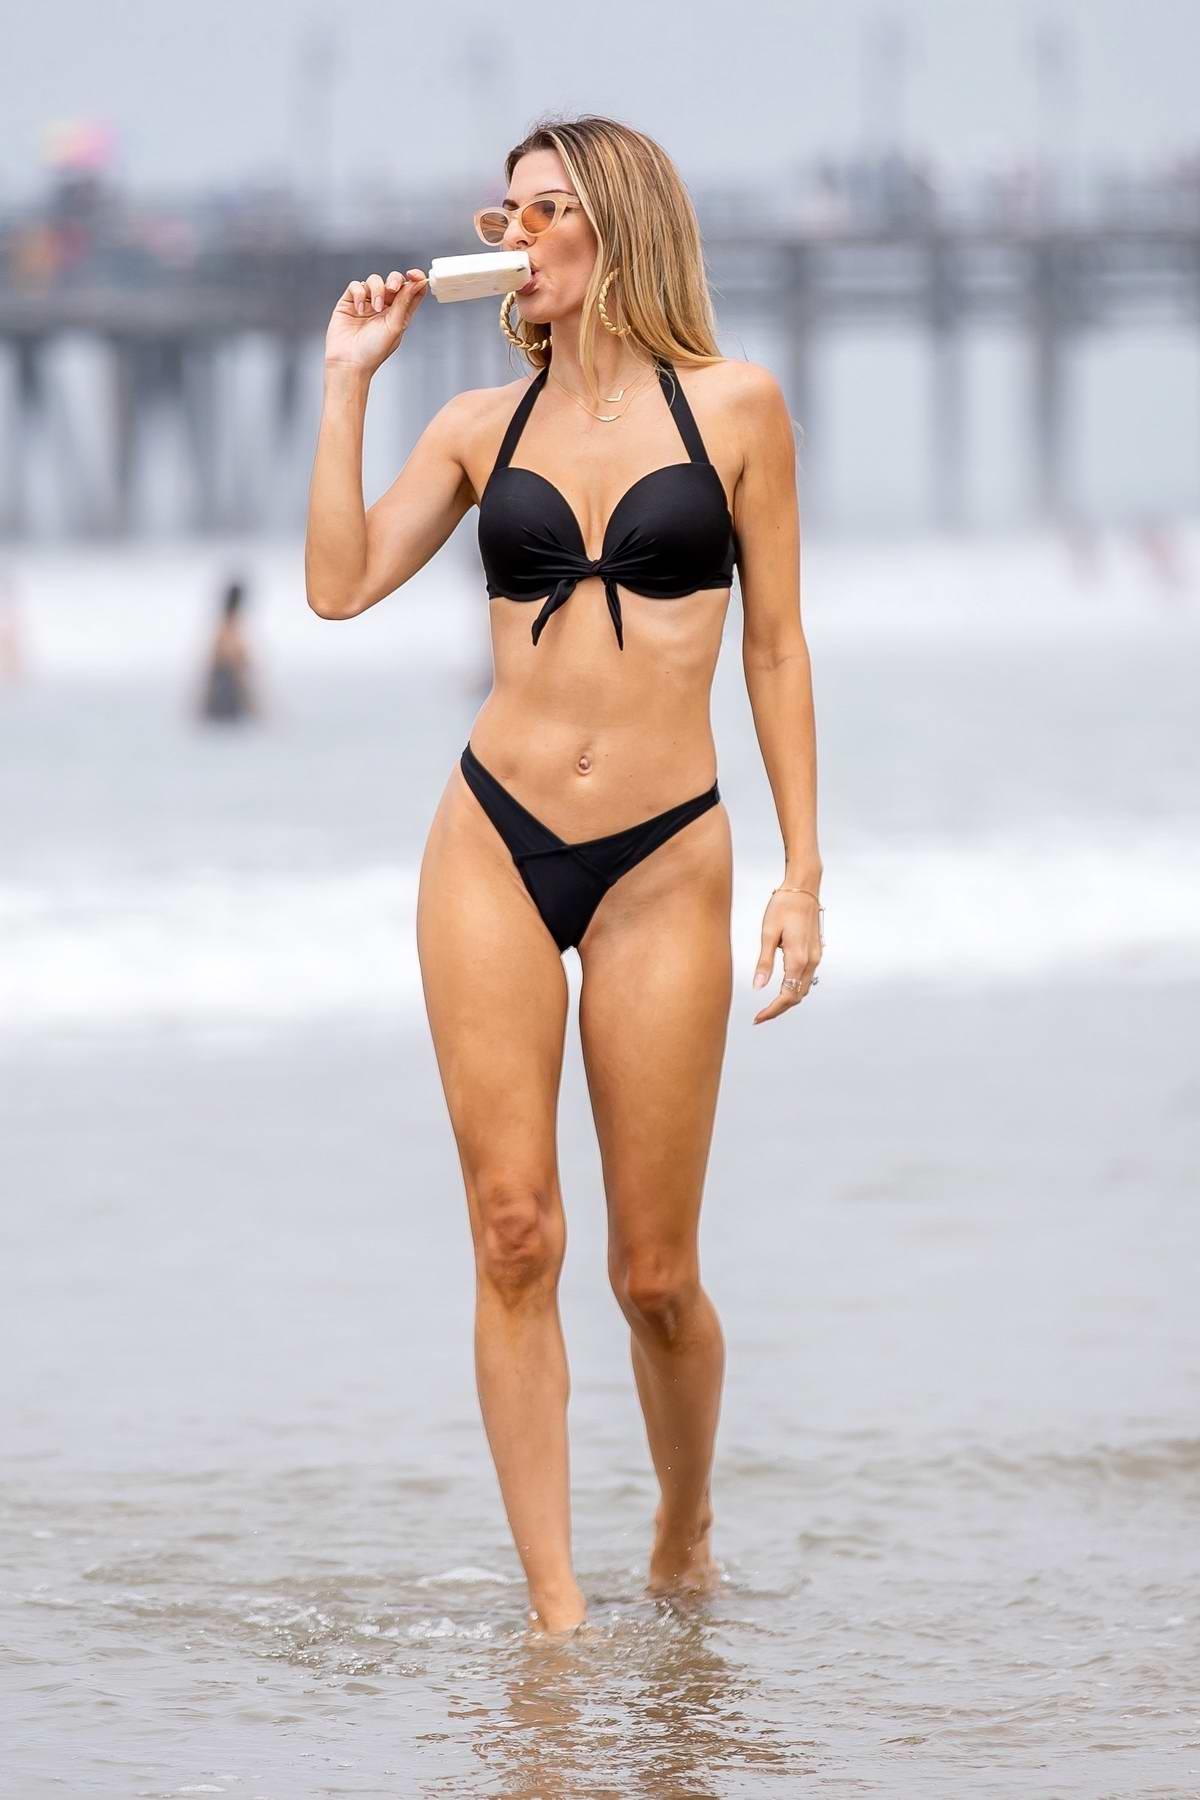 Rachel McCord cools off with an ice cream while she posing in a black bikini at the beach in Santa Monica, California